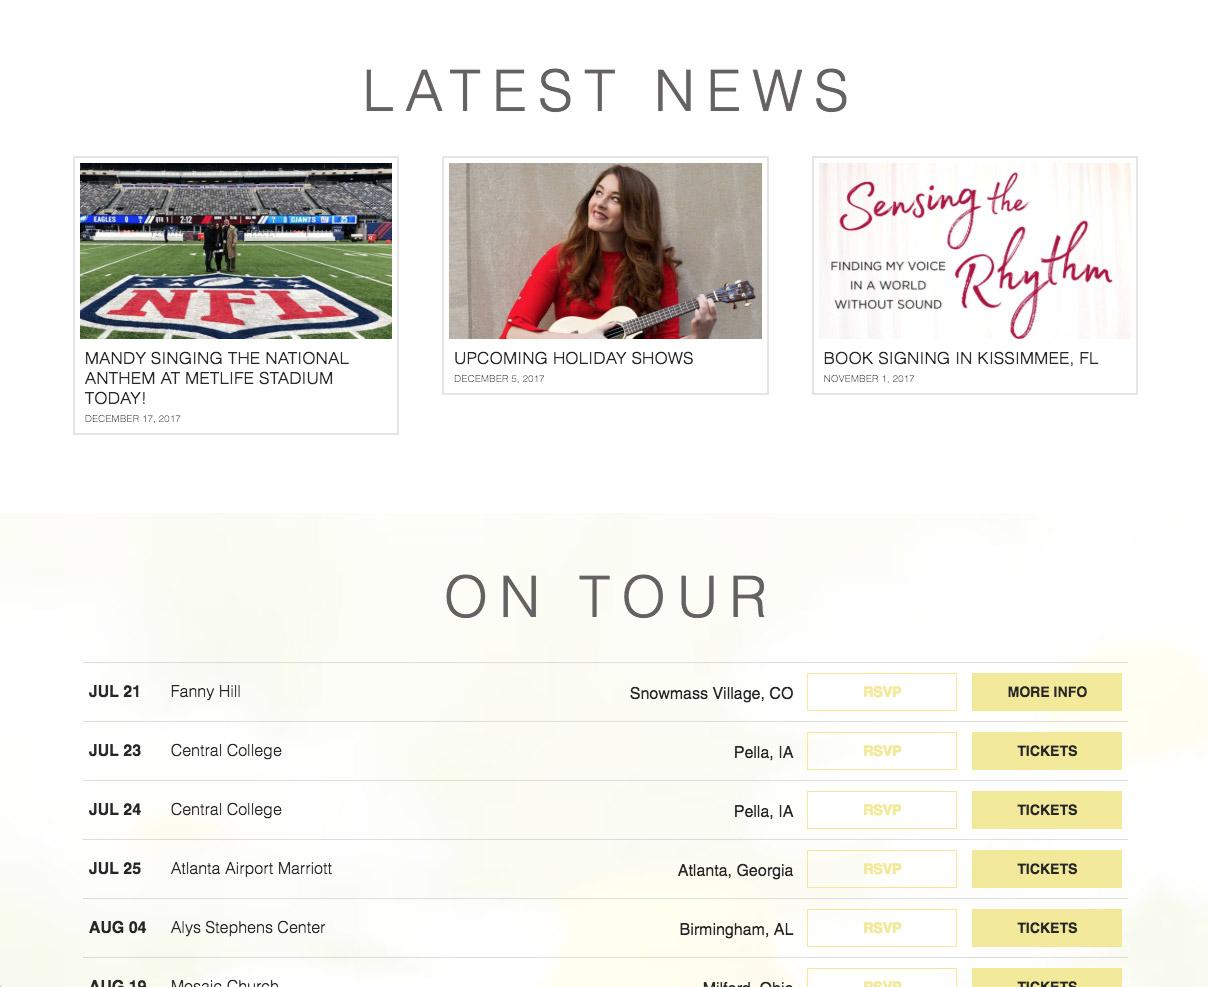 mandy harvey website screenshot of latest news and tour dates